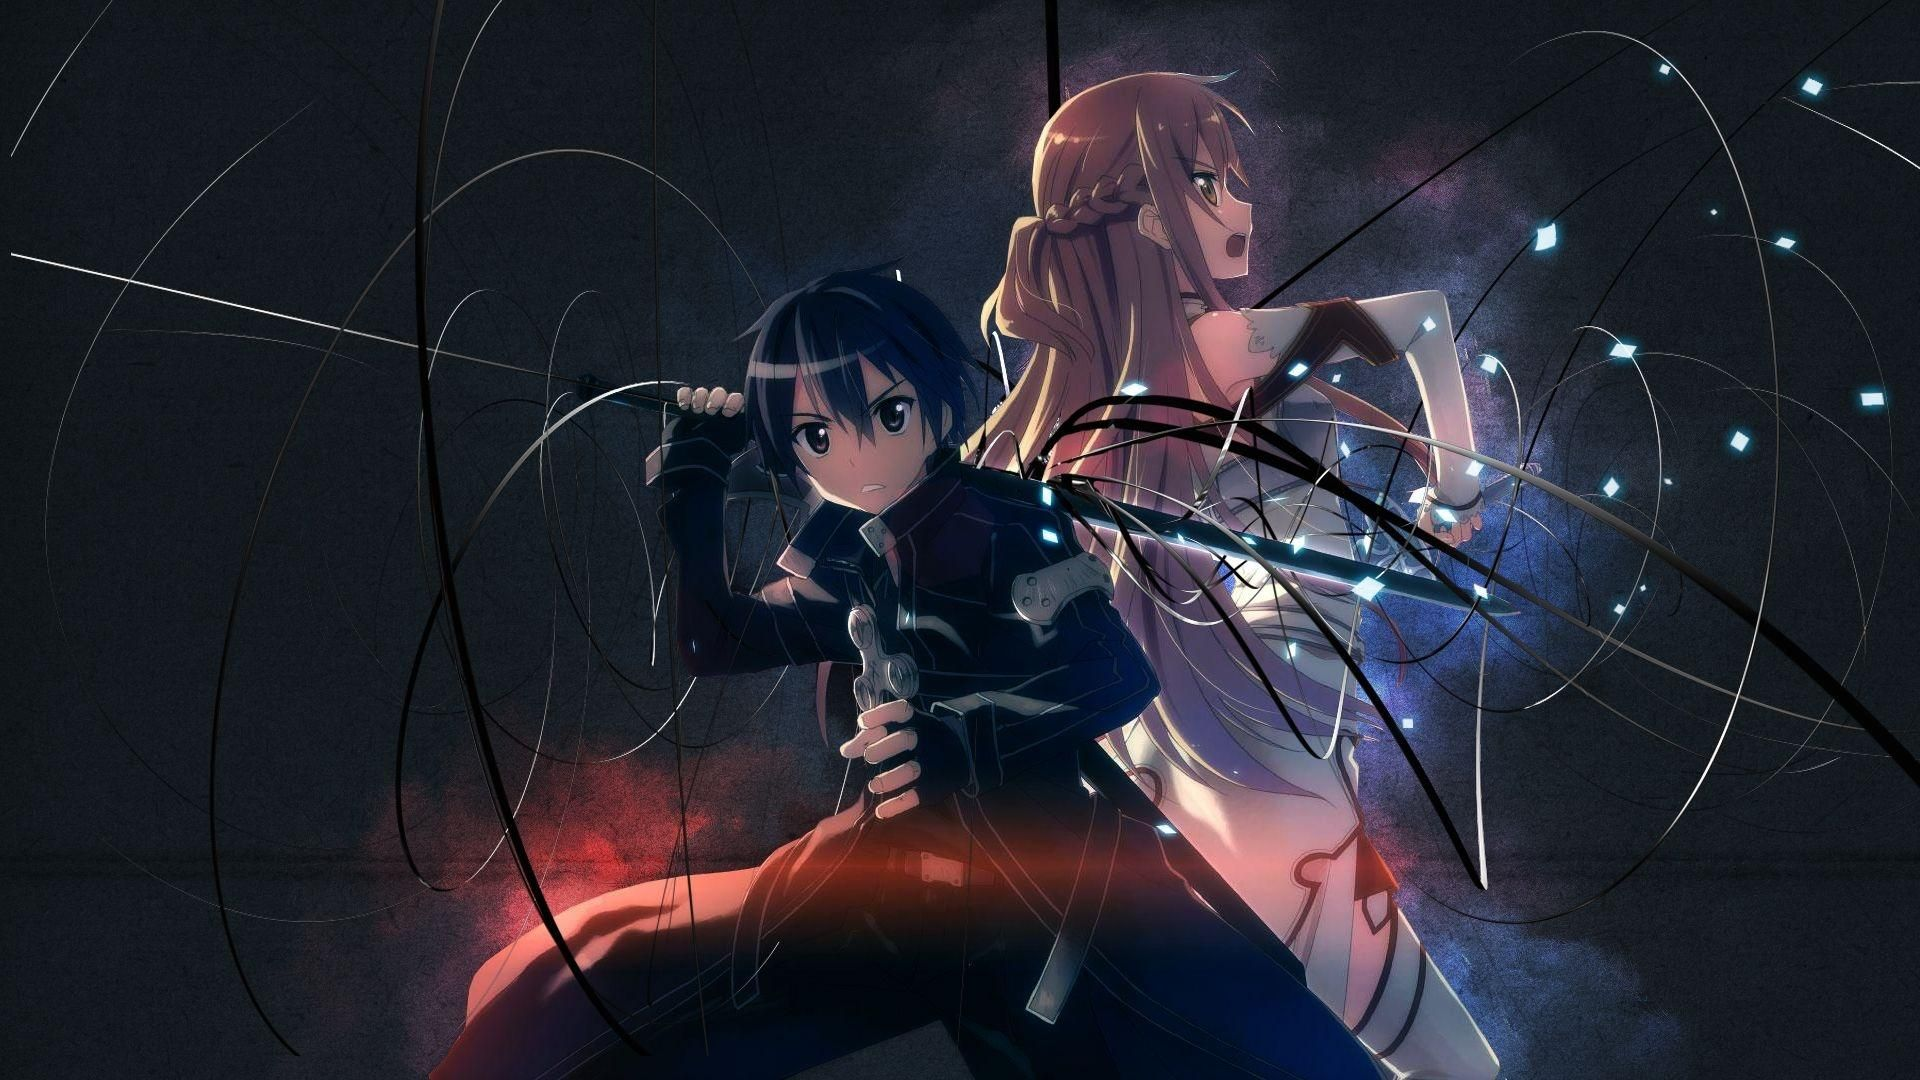 Dark Anime a wallpaper